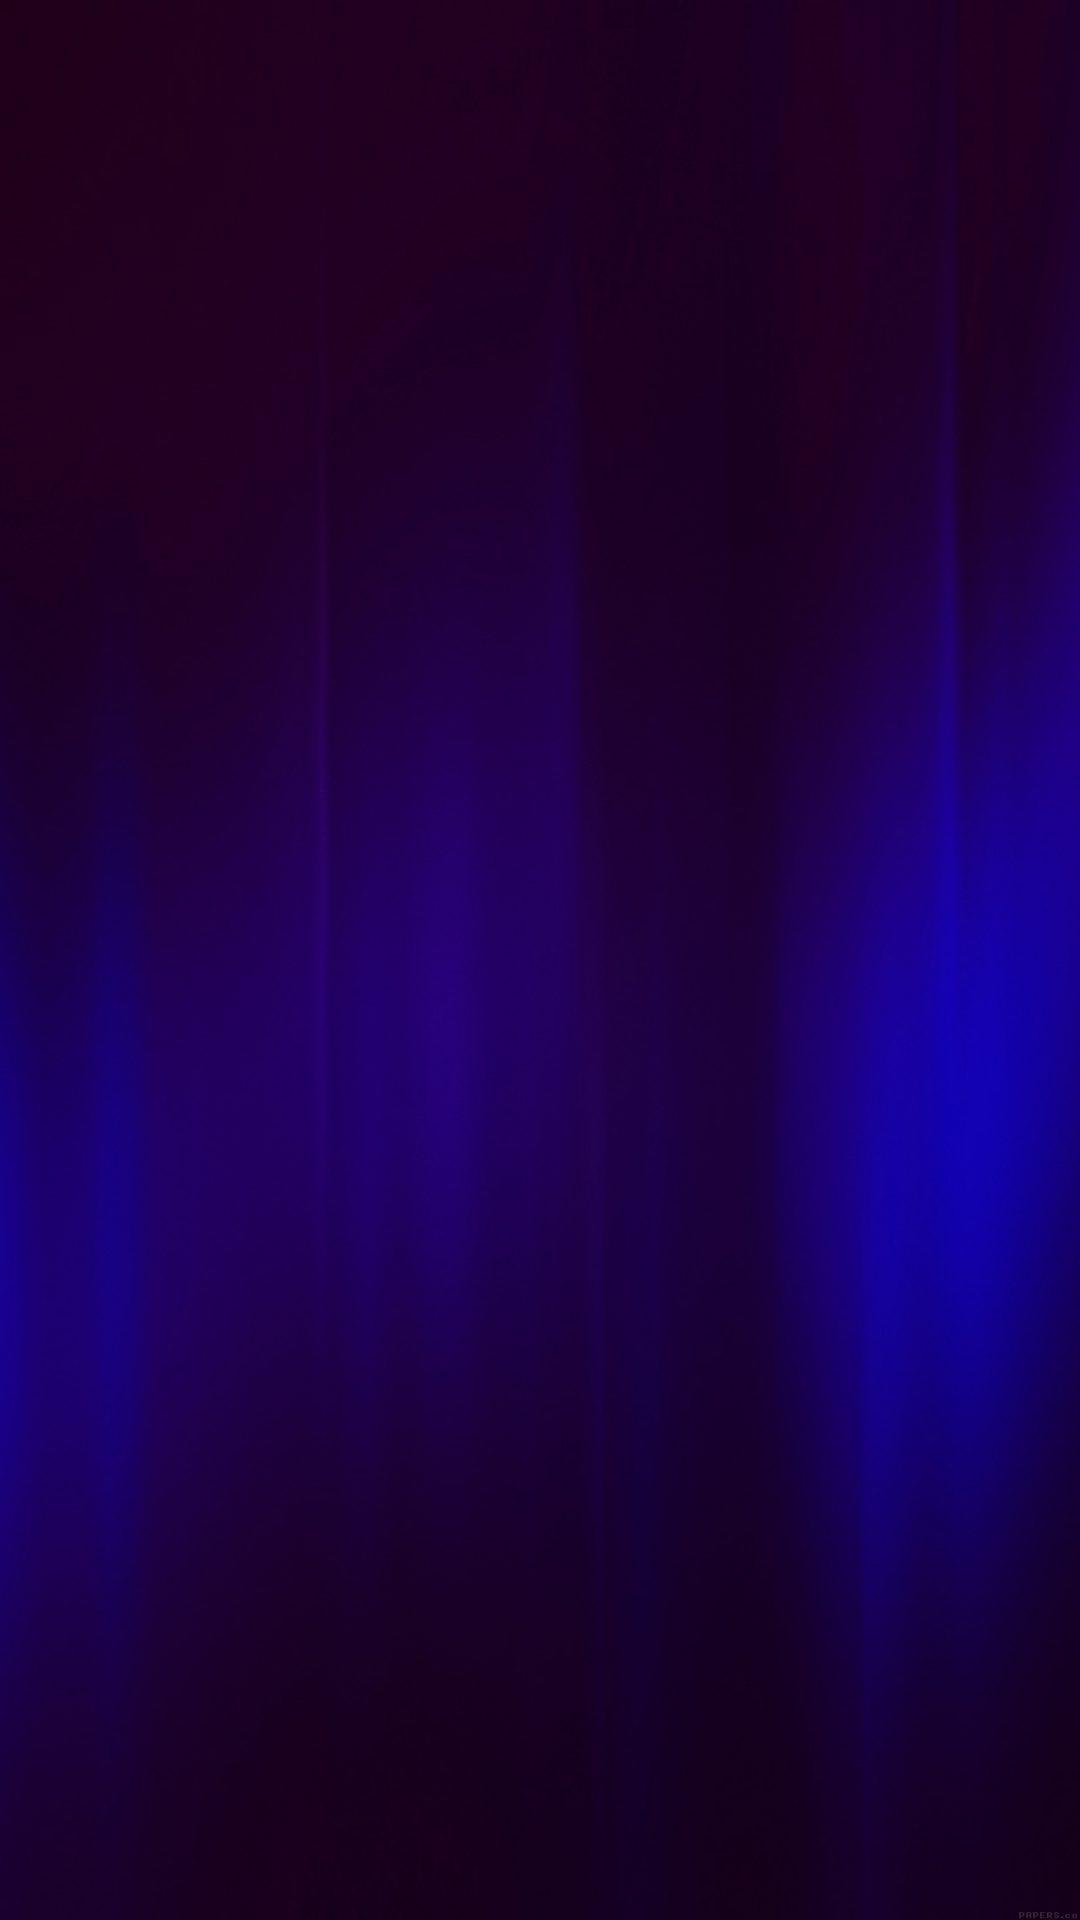 Retro Moden Dark Blue Abstract Pattern